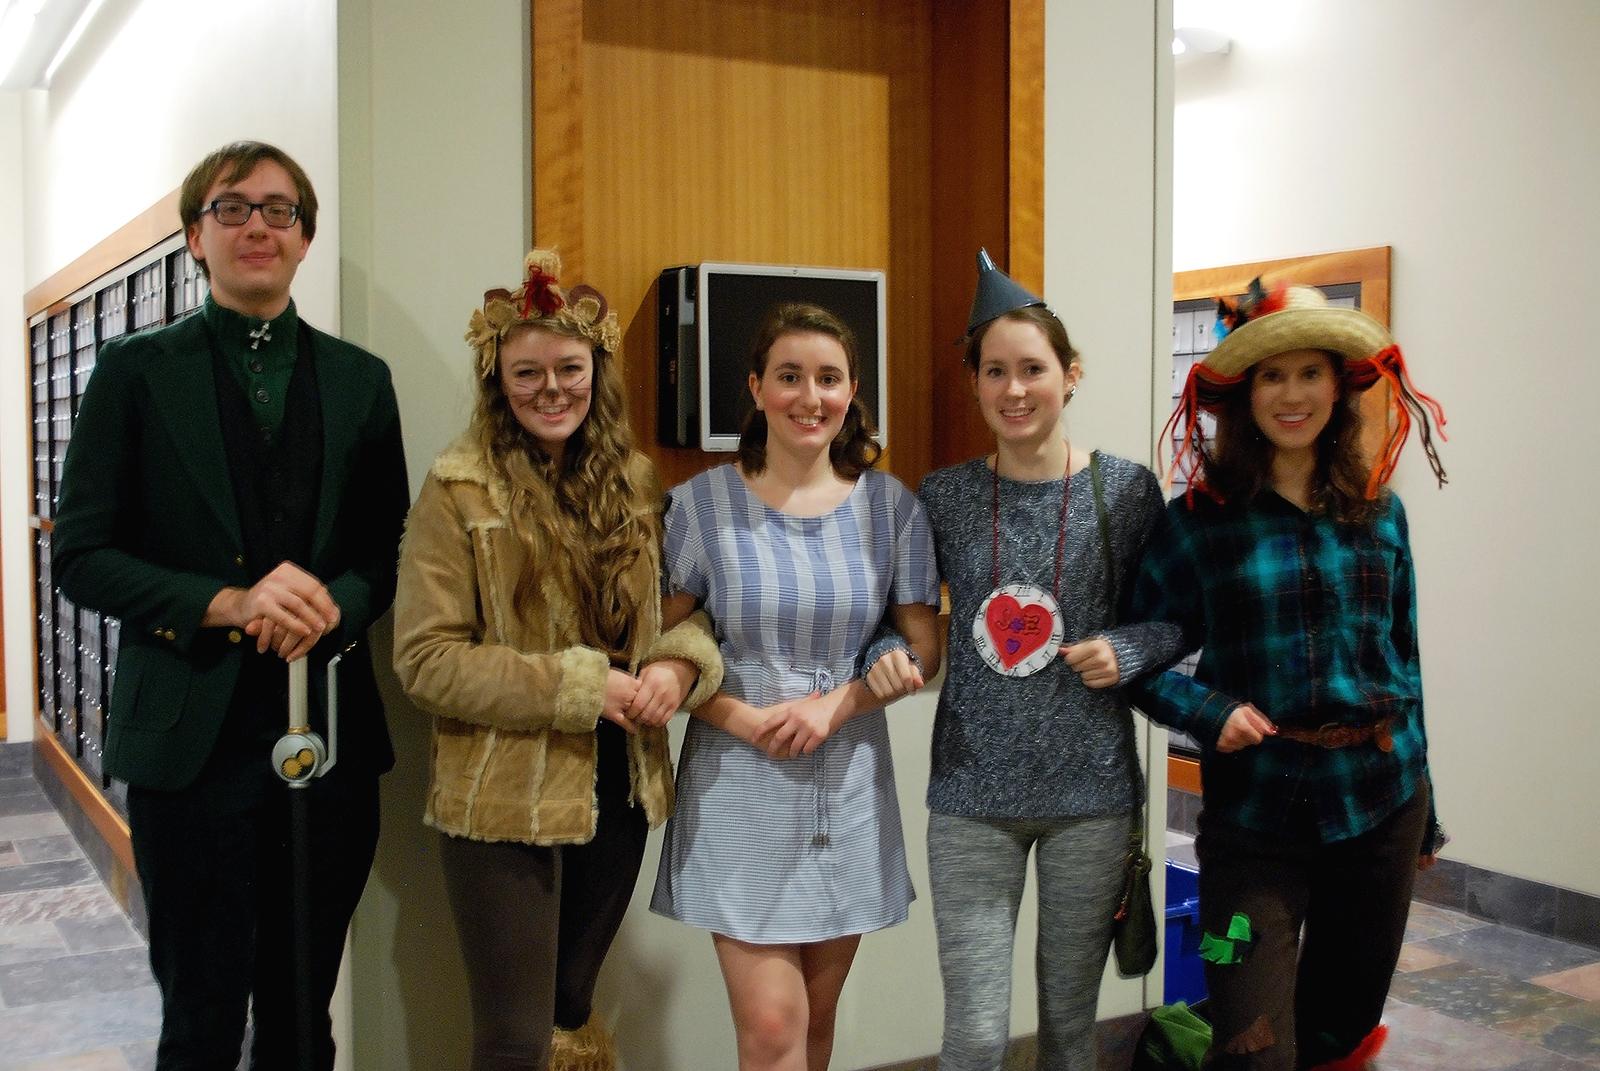 Left to right: Mathew Hjelle, Maddie Knudson, Mia Delasho, Emma Fletcher and Ellie Van Why in Wizard of Oz costumes.  Photo by Larissa Davis